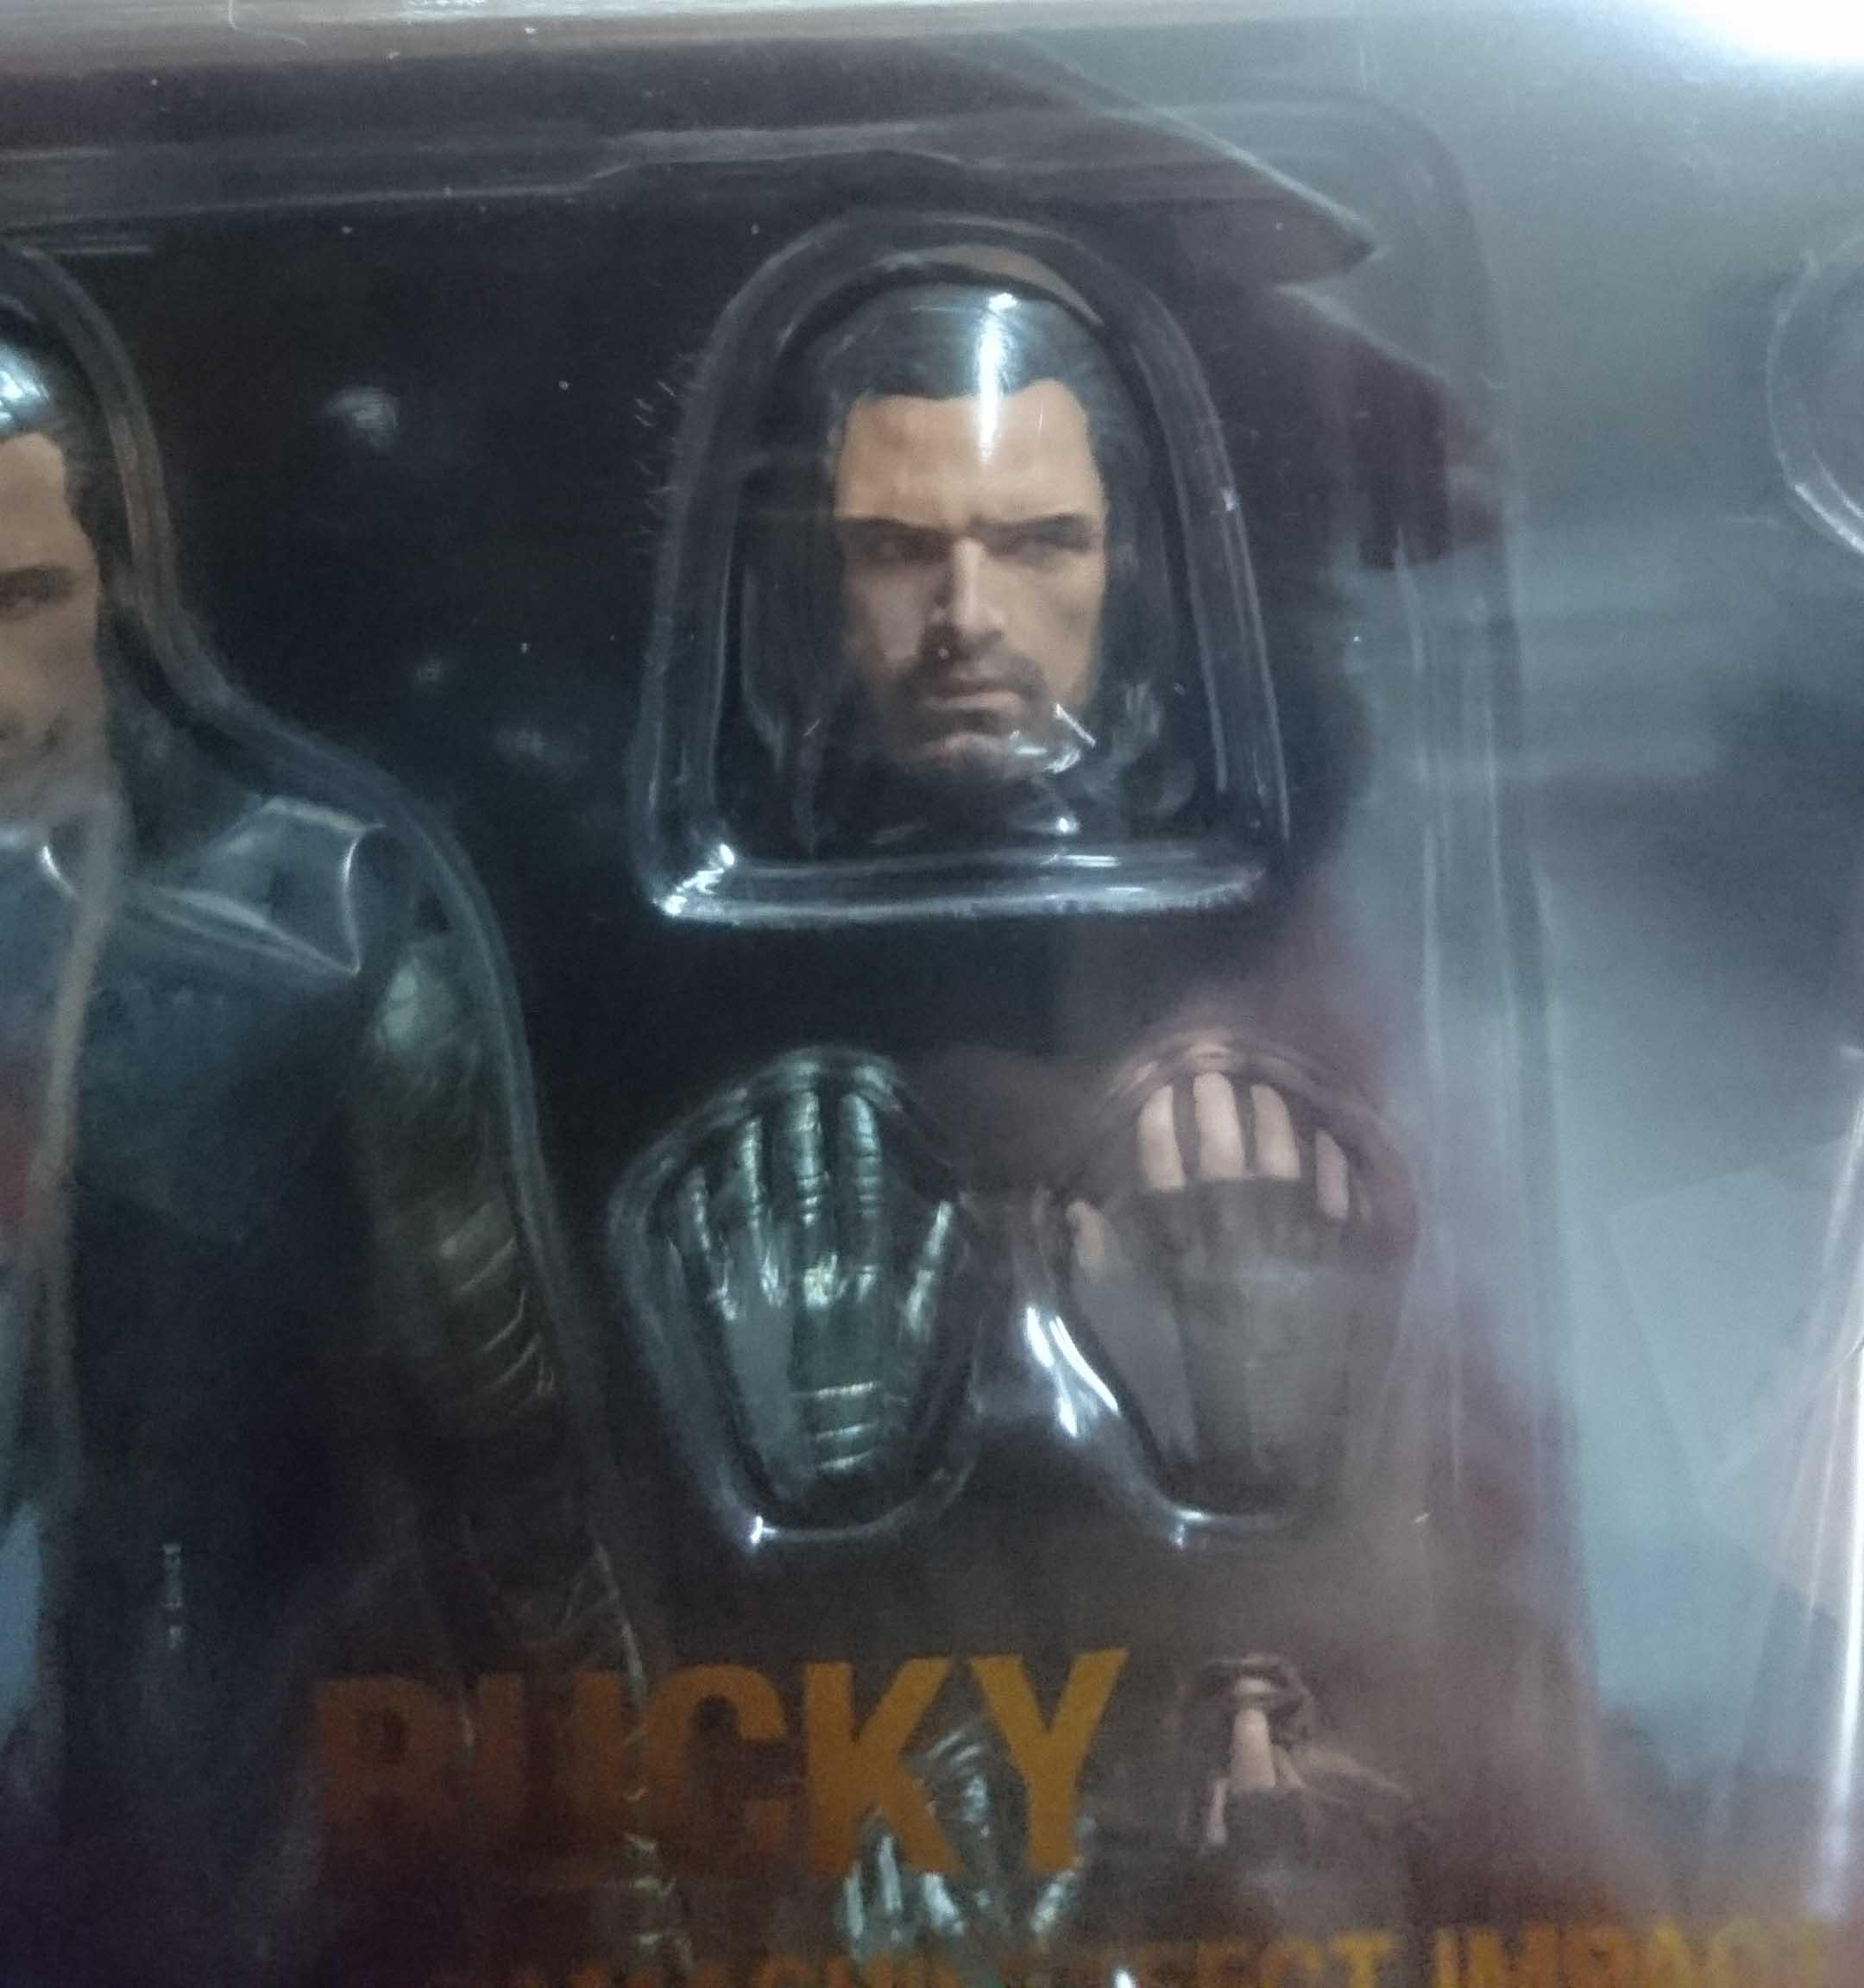 SHF 復仇者聯盟3 無限之戰 酷寒戰士 巴奇&魂 EFFECT IMPACT,益祥模型玩具外盒實際拍攝照片。